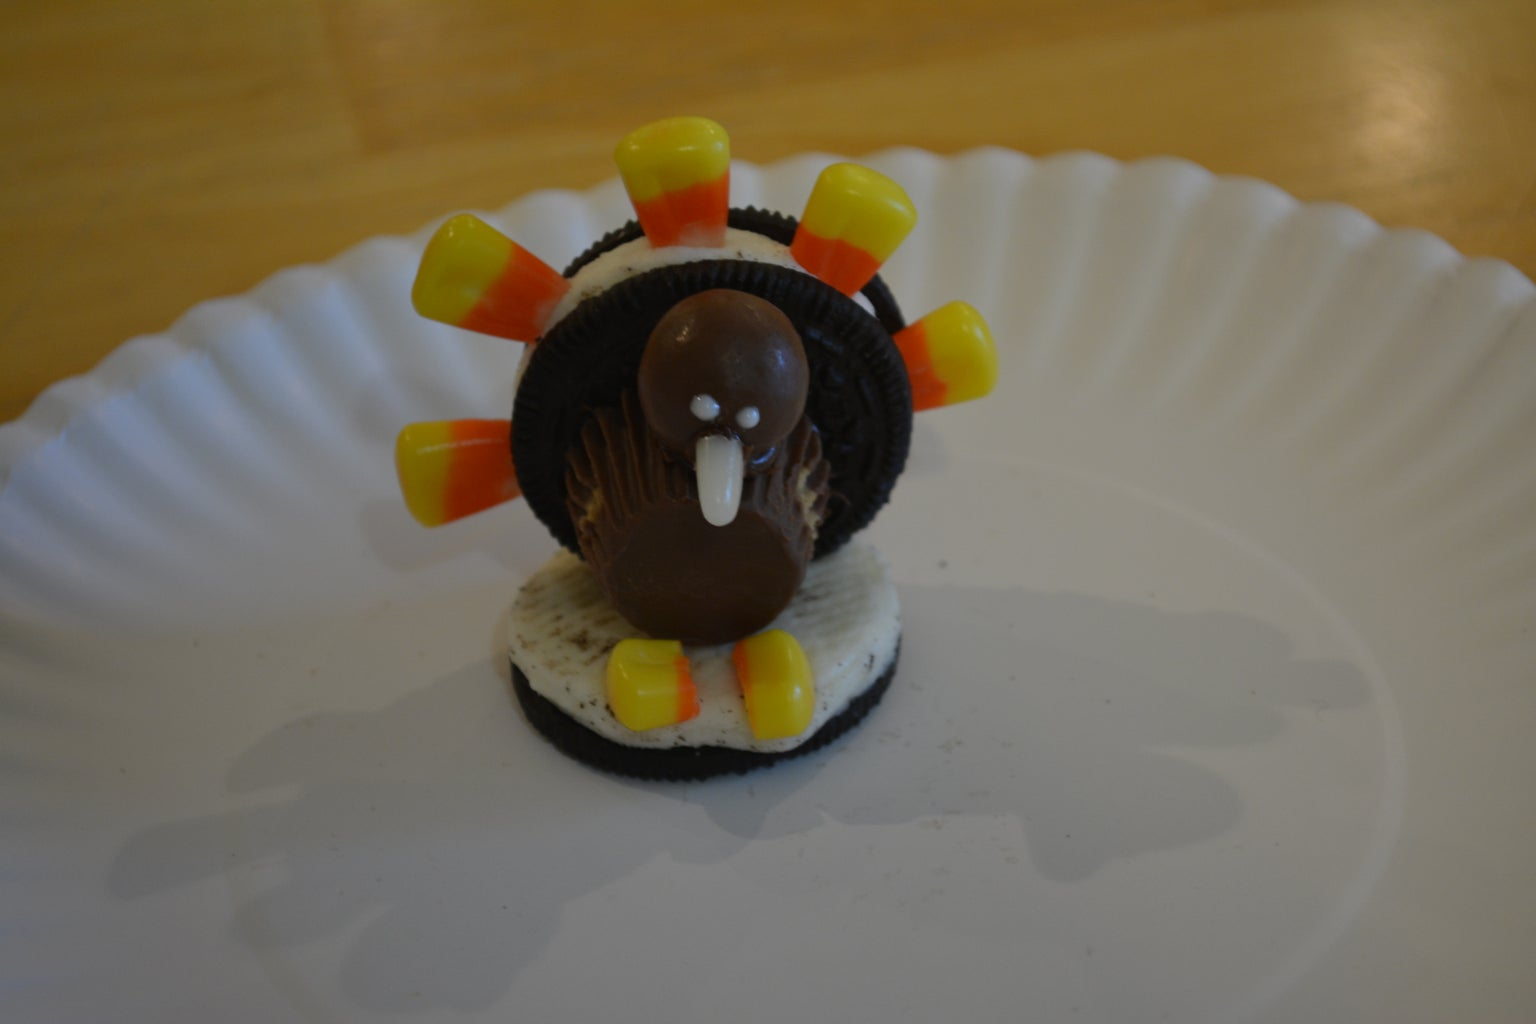 How to Make Oreo Cookie Turkeys